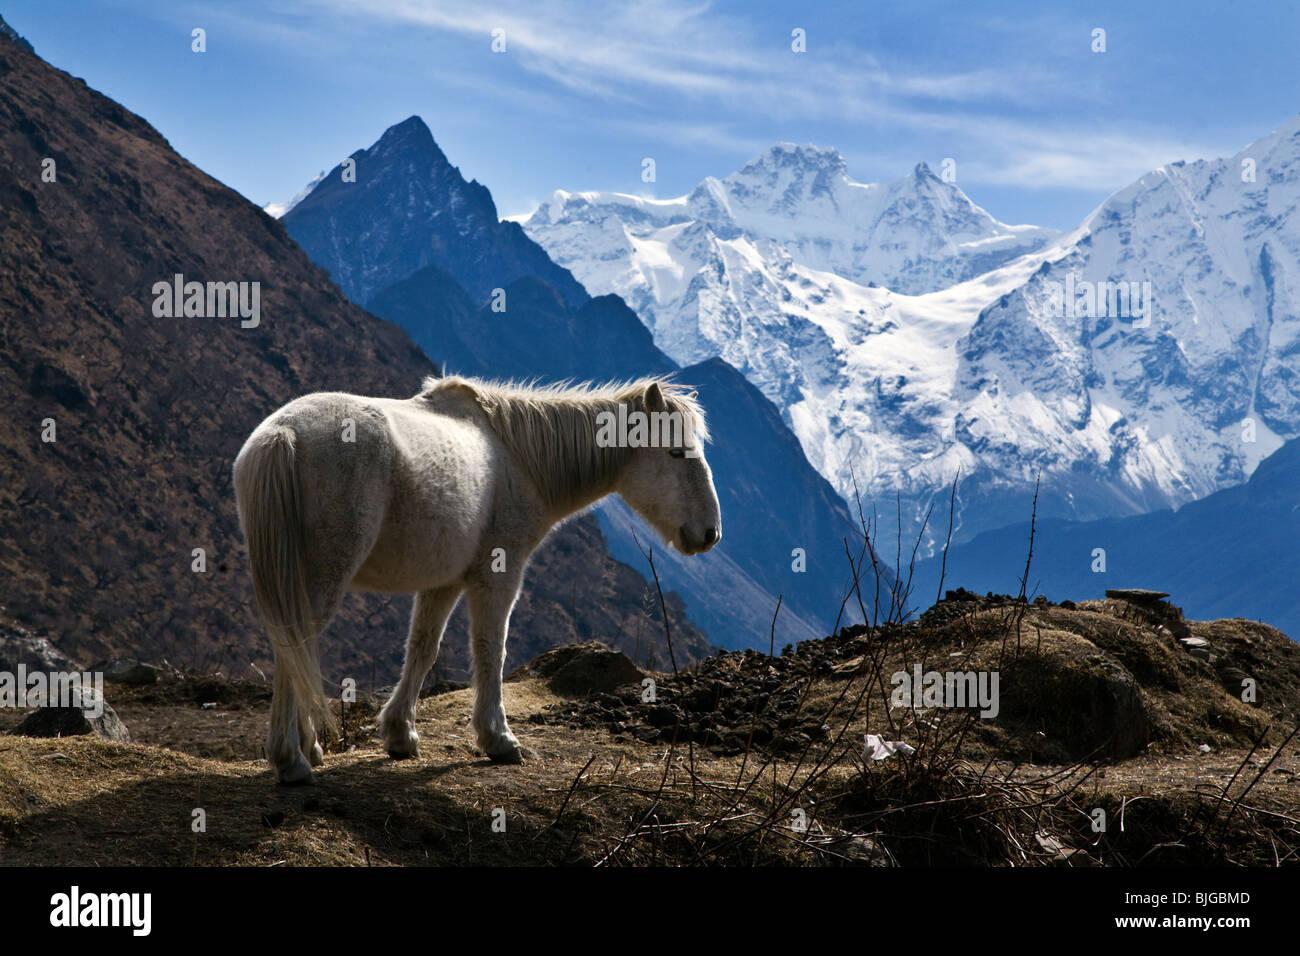 HIMAL CHULI and a white HORSE in the village of SAMDO on the AROUND MANASLU TREK - NUPRI REGION, NEPAL - Stock Image